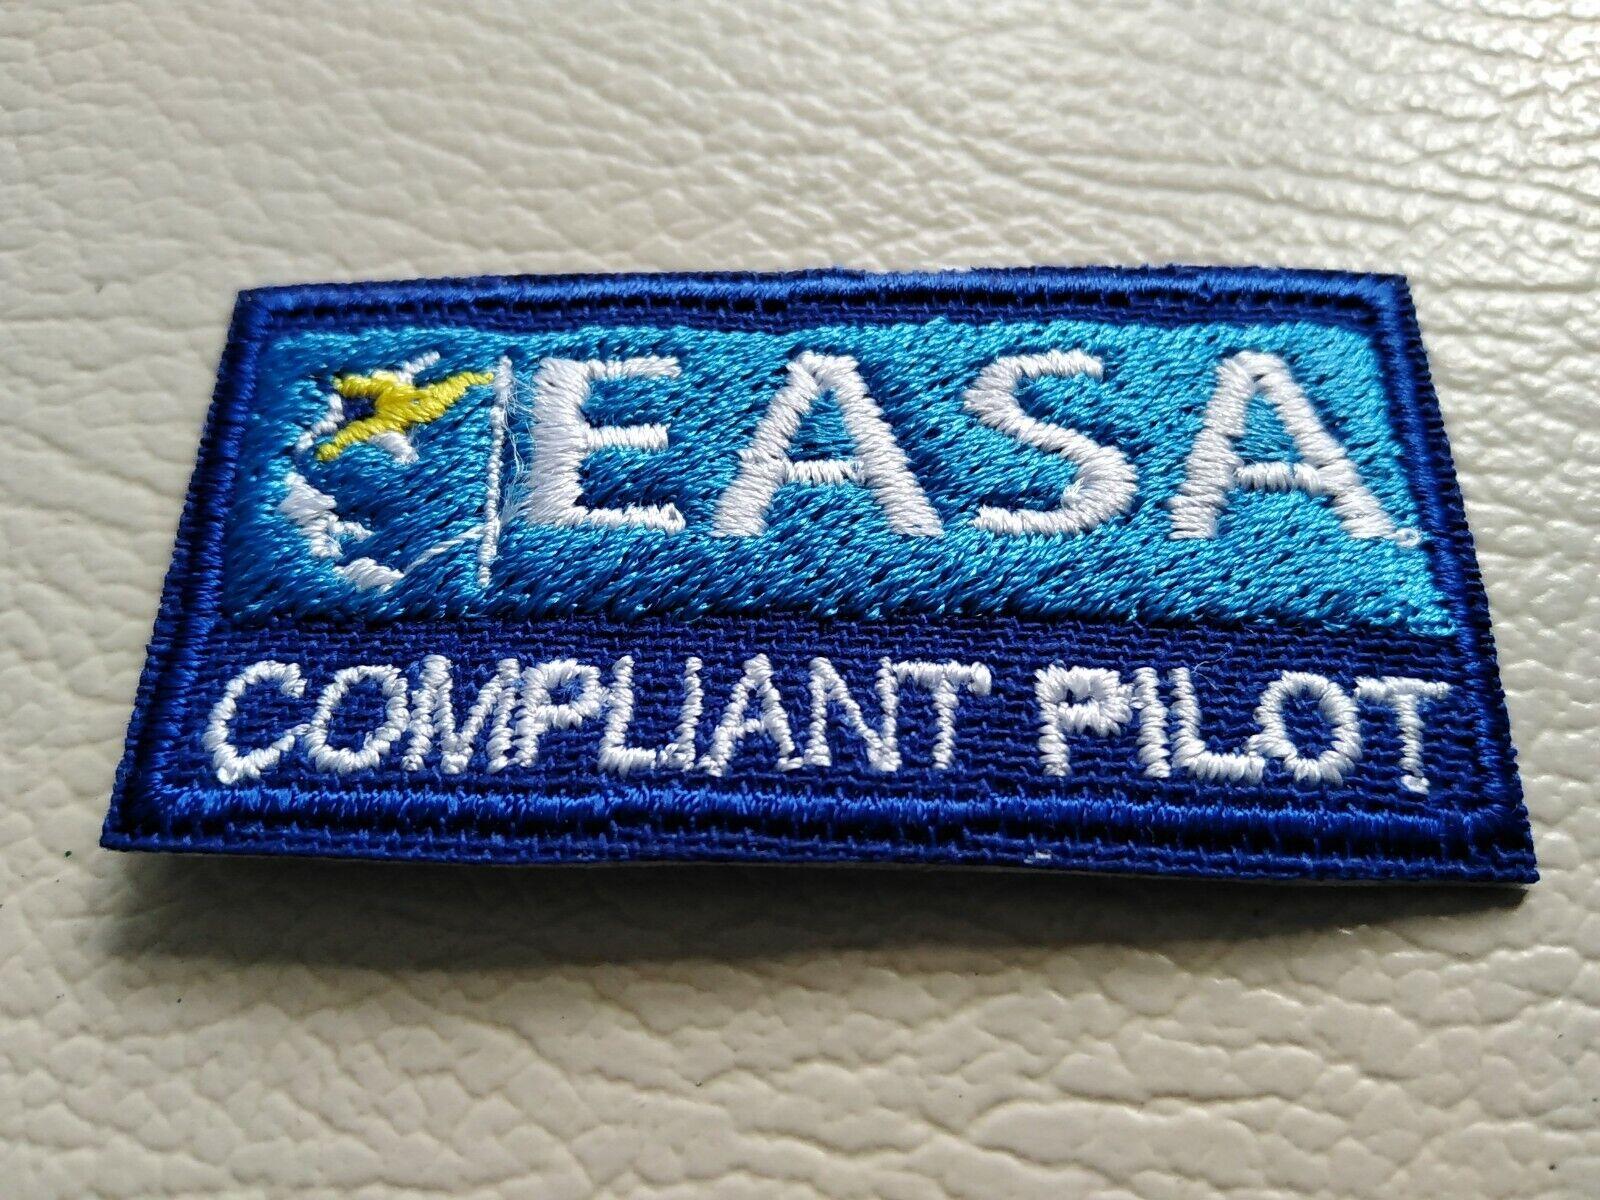 EASA Compliant Drone / UAV Pilot Iron On Patch A2CofC